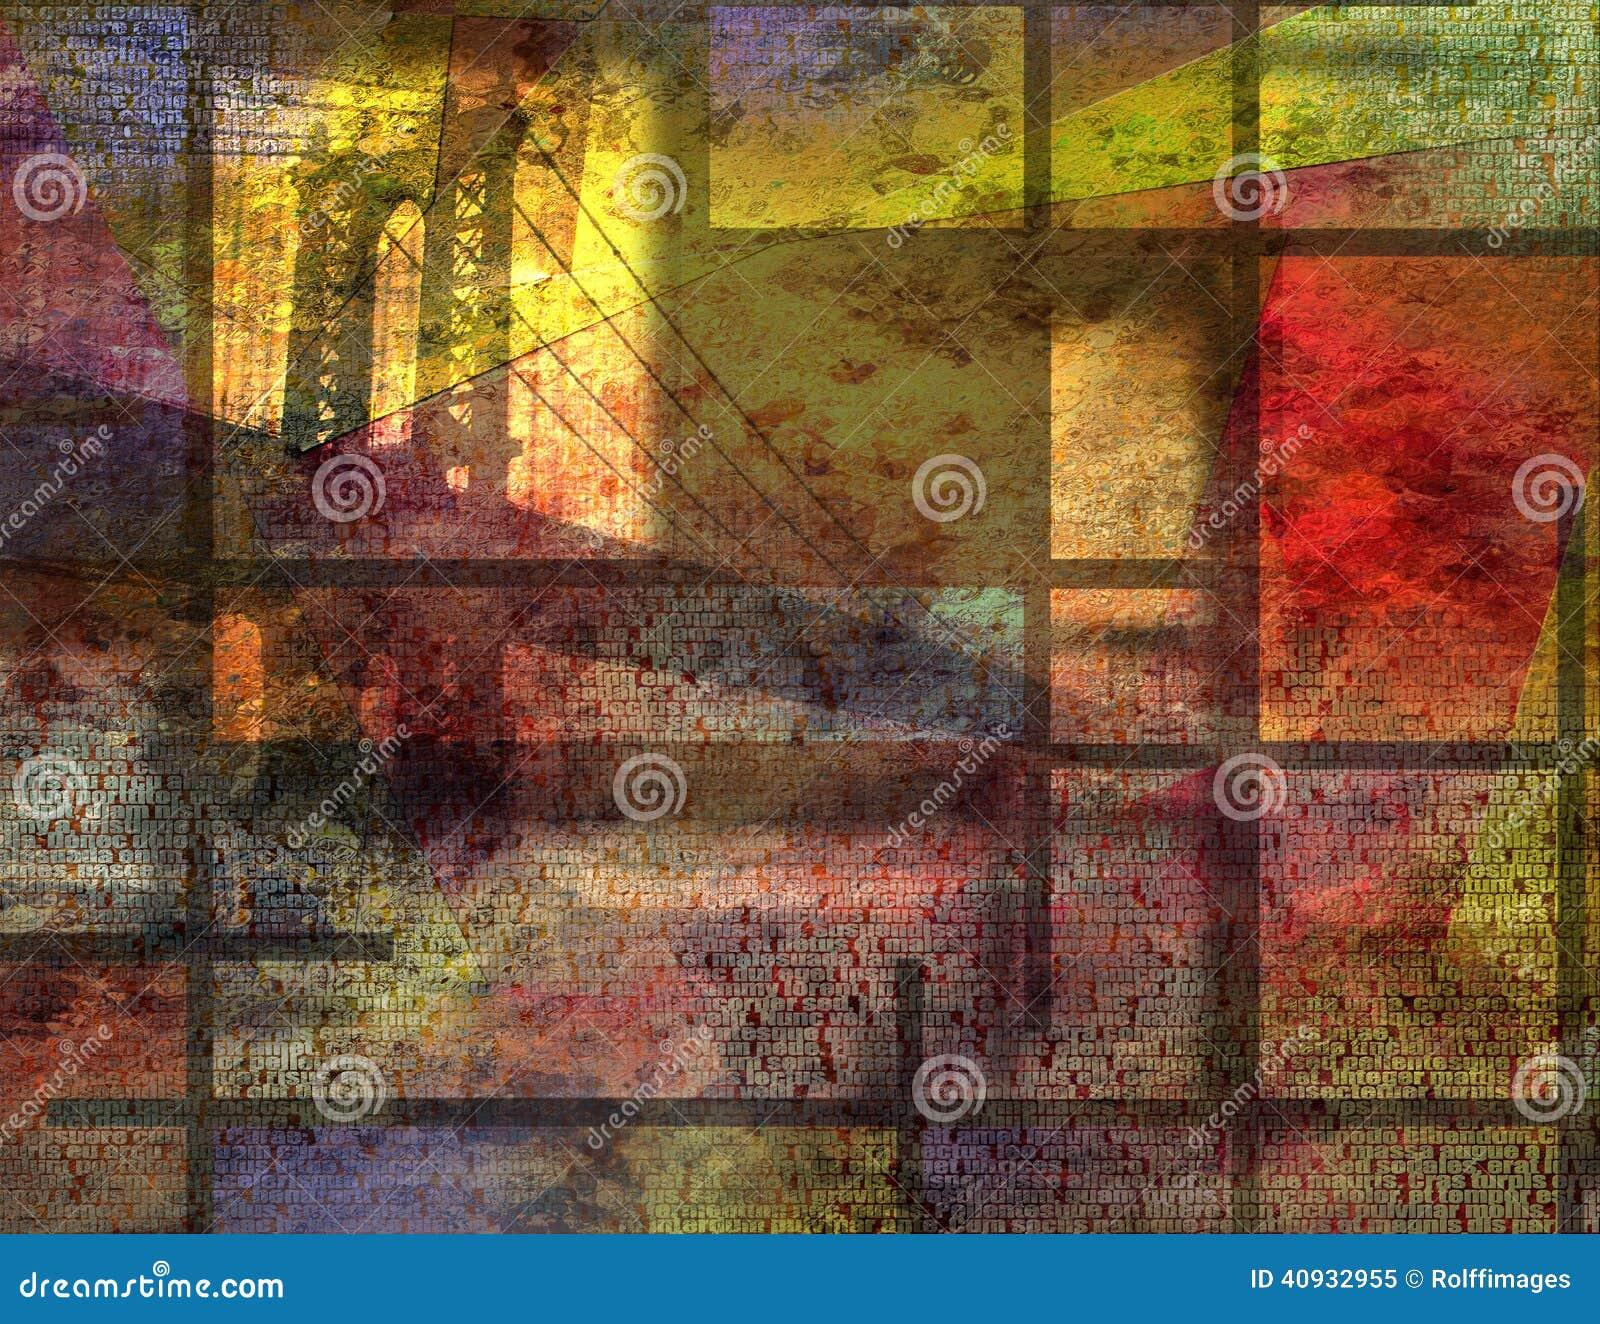 The Landscape Of Modernity Essays On New York City – 355583